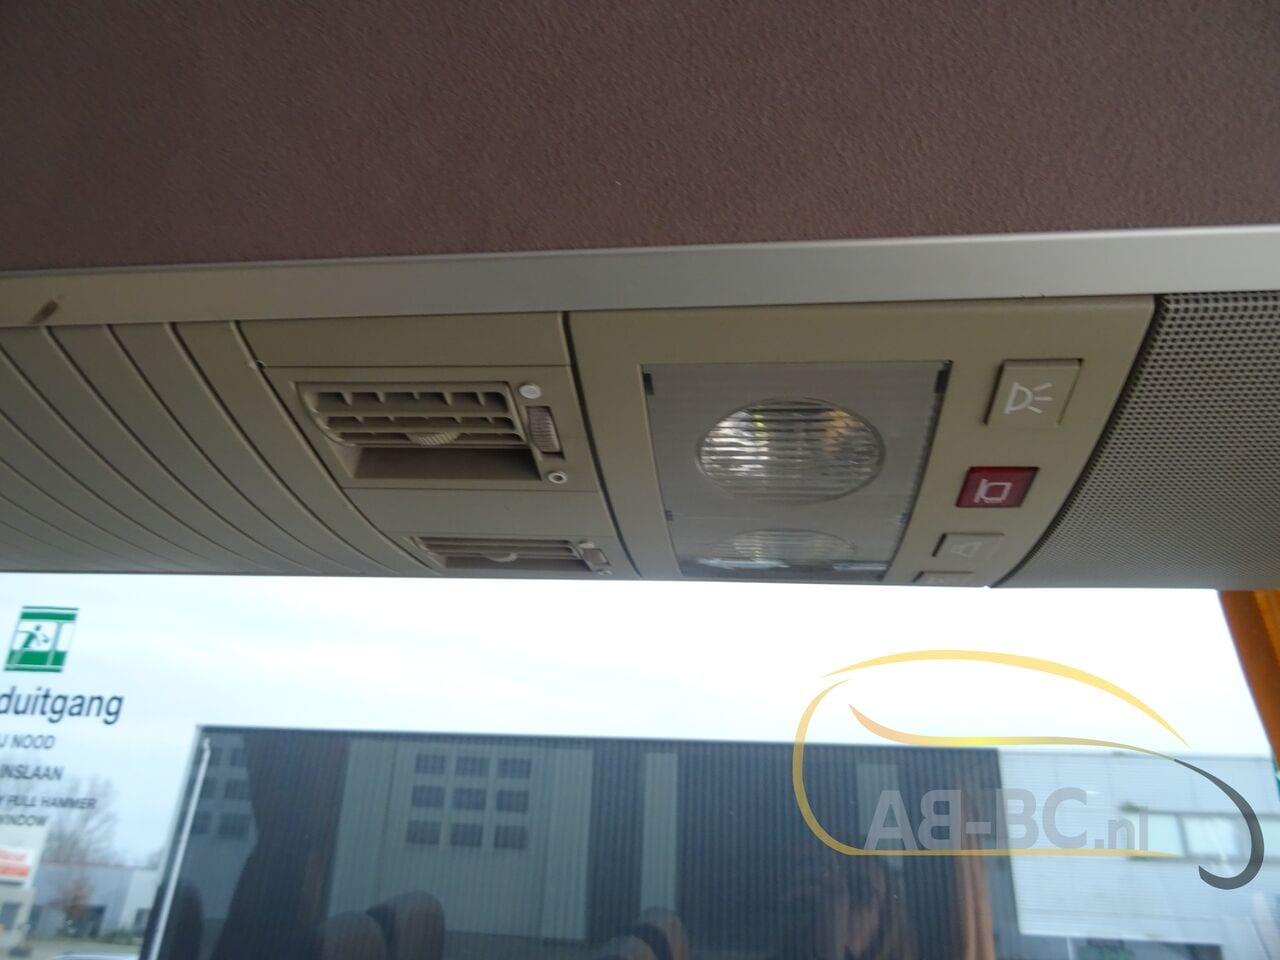 coach-busTEMSA-Safari-HD-51-Seats-EURO5-12-MTR---1614266597687352466_big_dbd74c04e70e22e49f78855333cabeb7--19052917224730818200